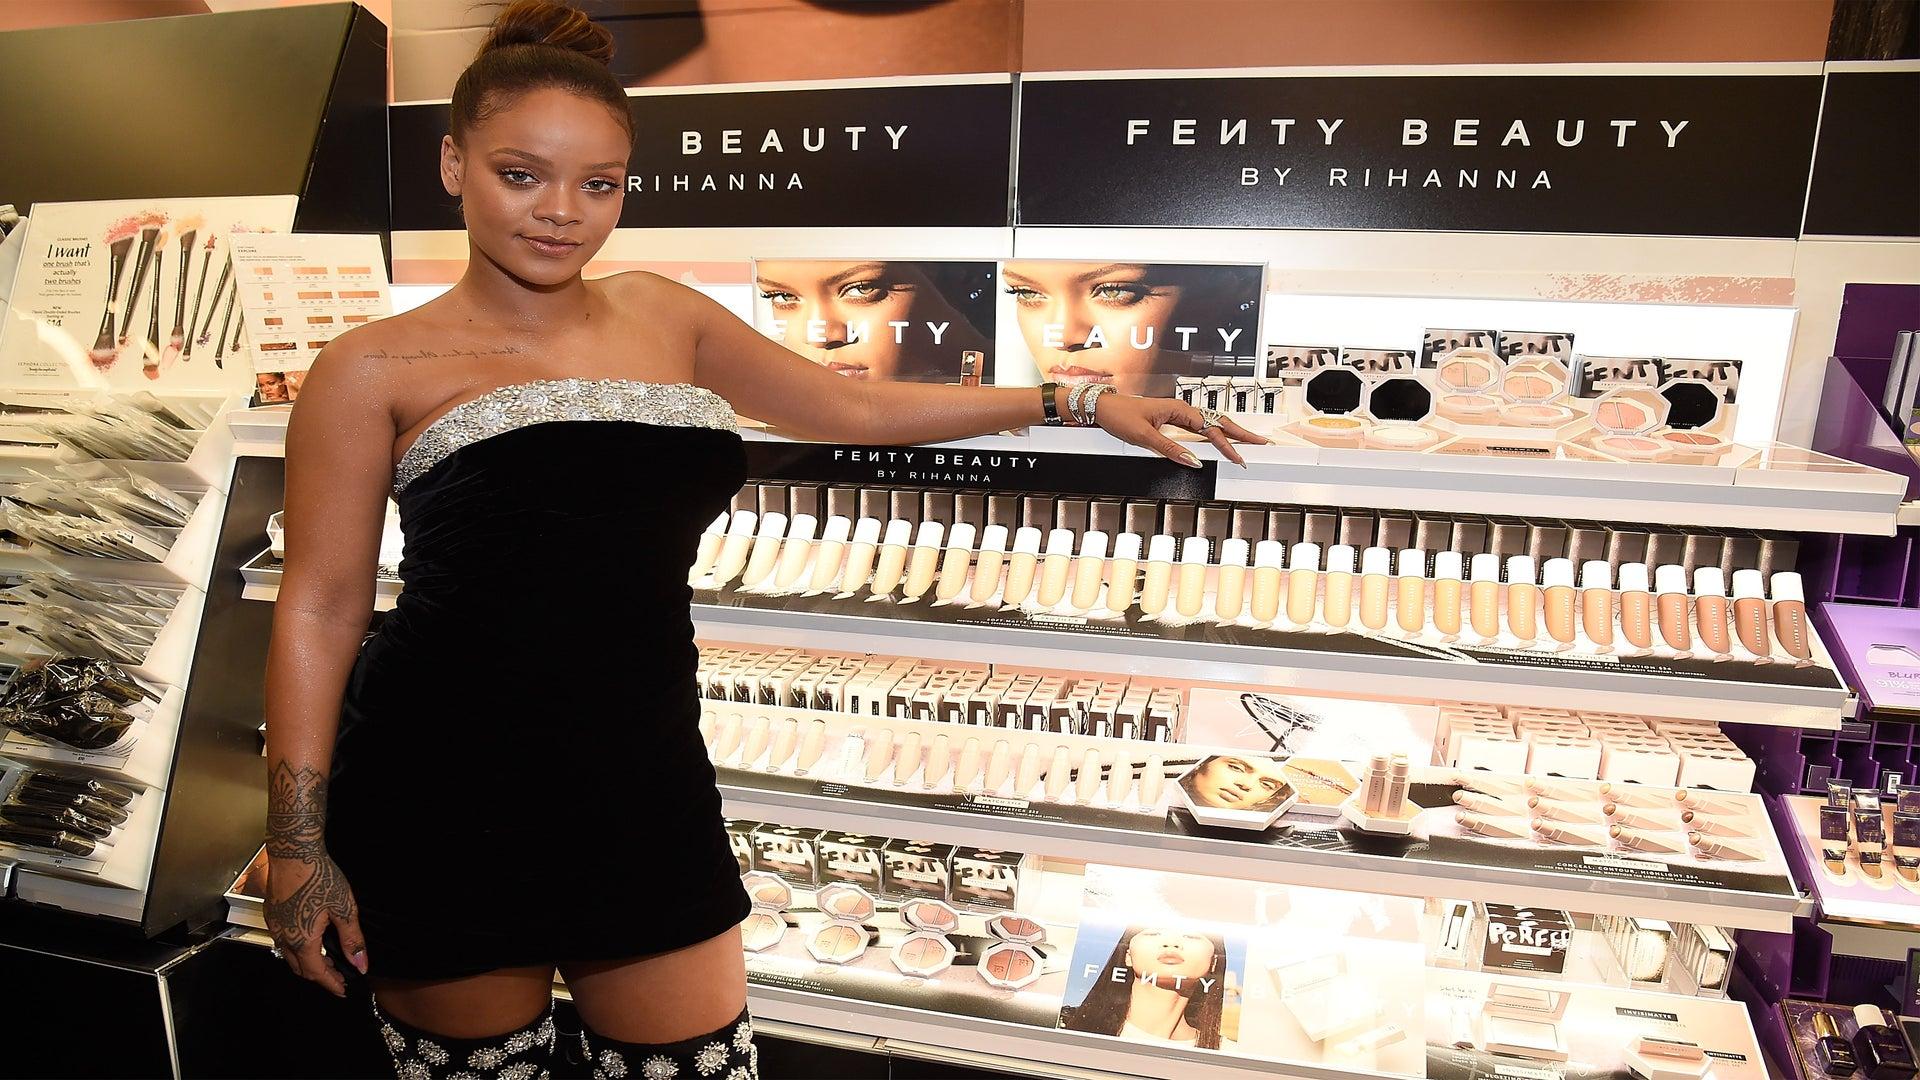 7 Key Products You Need From Rihanna's Fenty Beauty Line